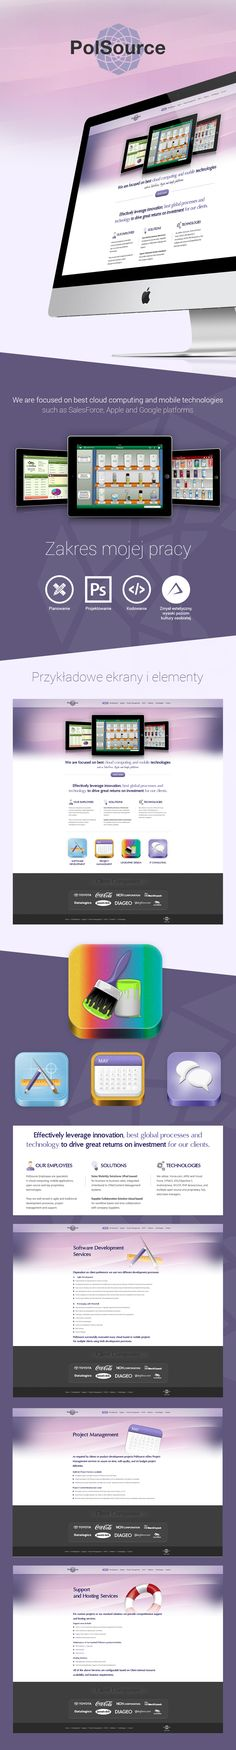 Polsource website | Webdesign | Web | Design | html/css/js | Web Graphics